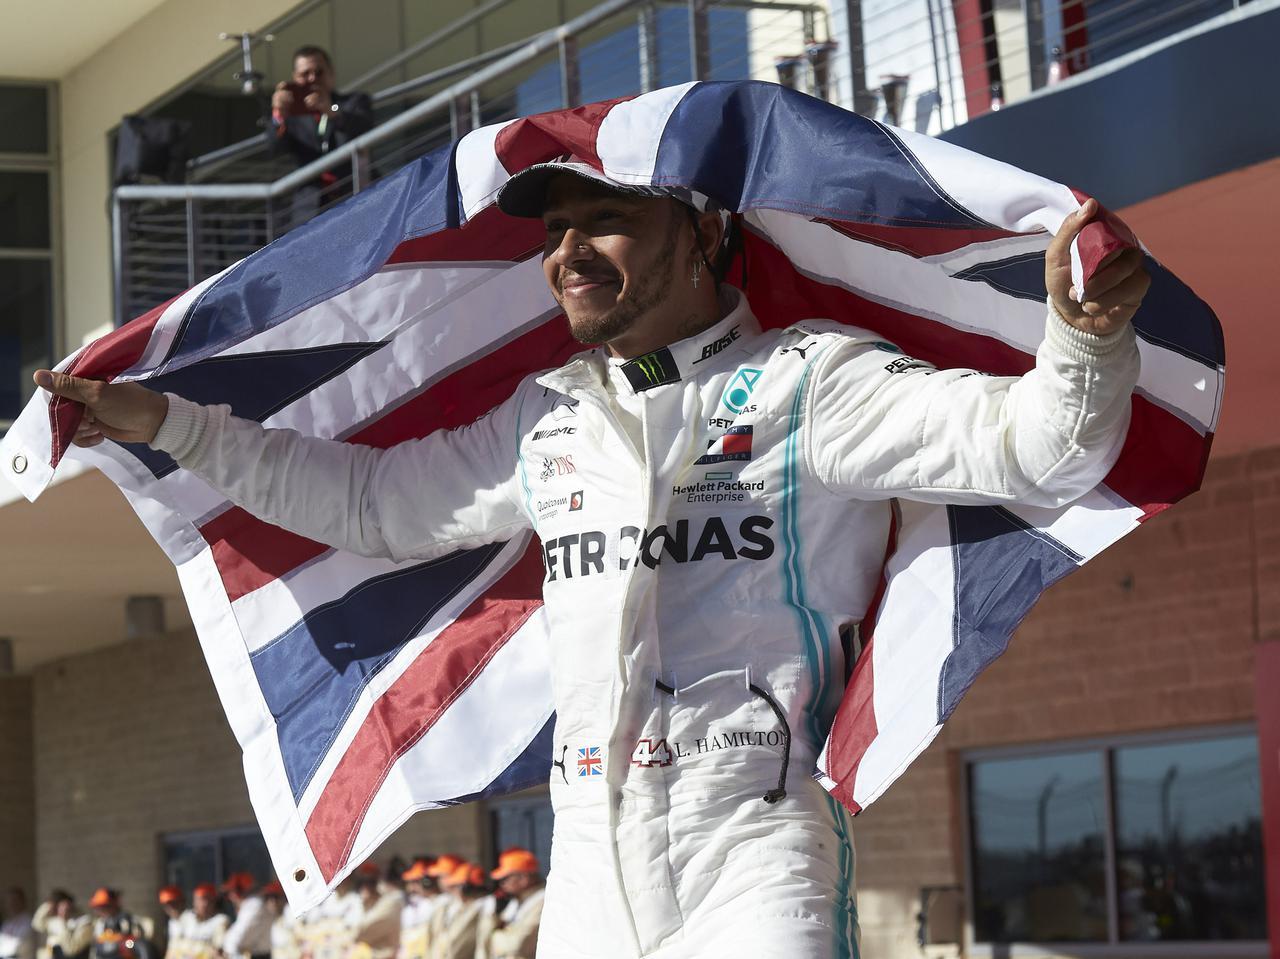 F1第19戦アメリカGP、ハミルトンが3年連続6度目のドライバーズタイトルを獲得【モータースポーツ】